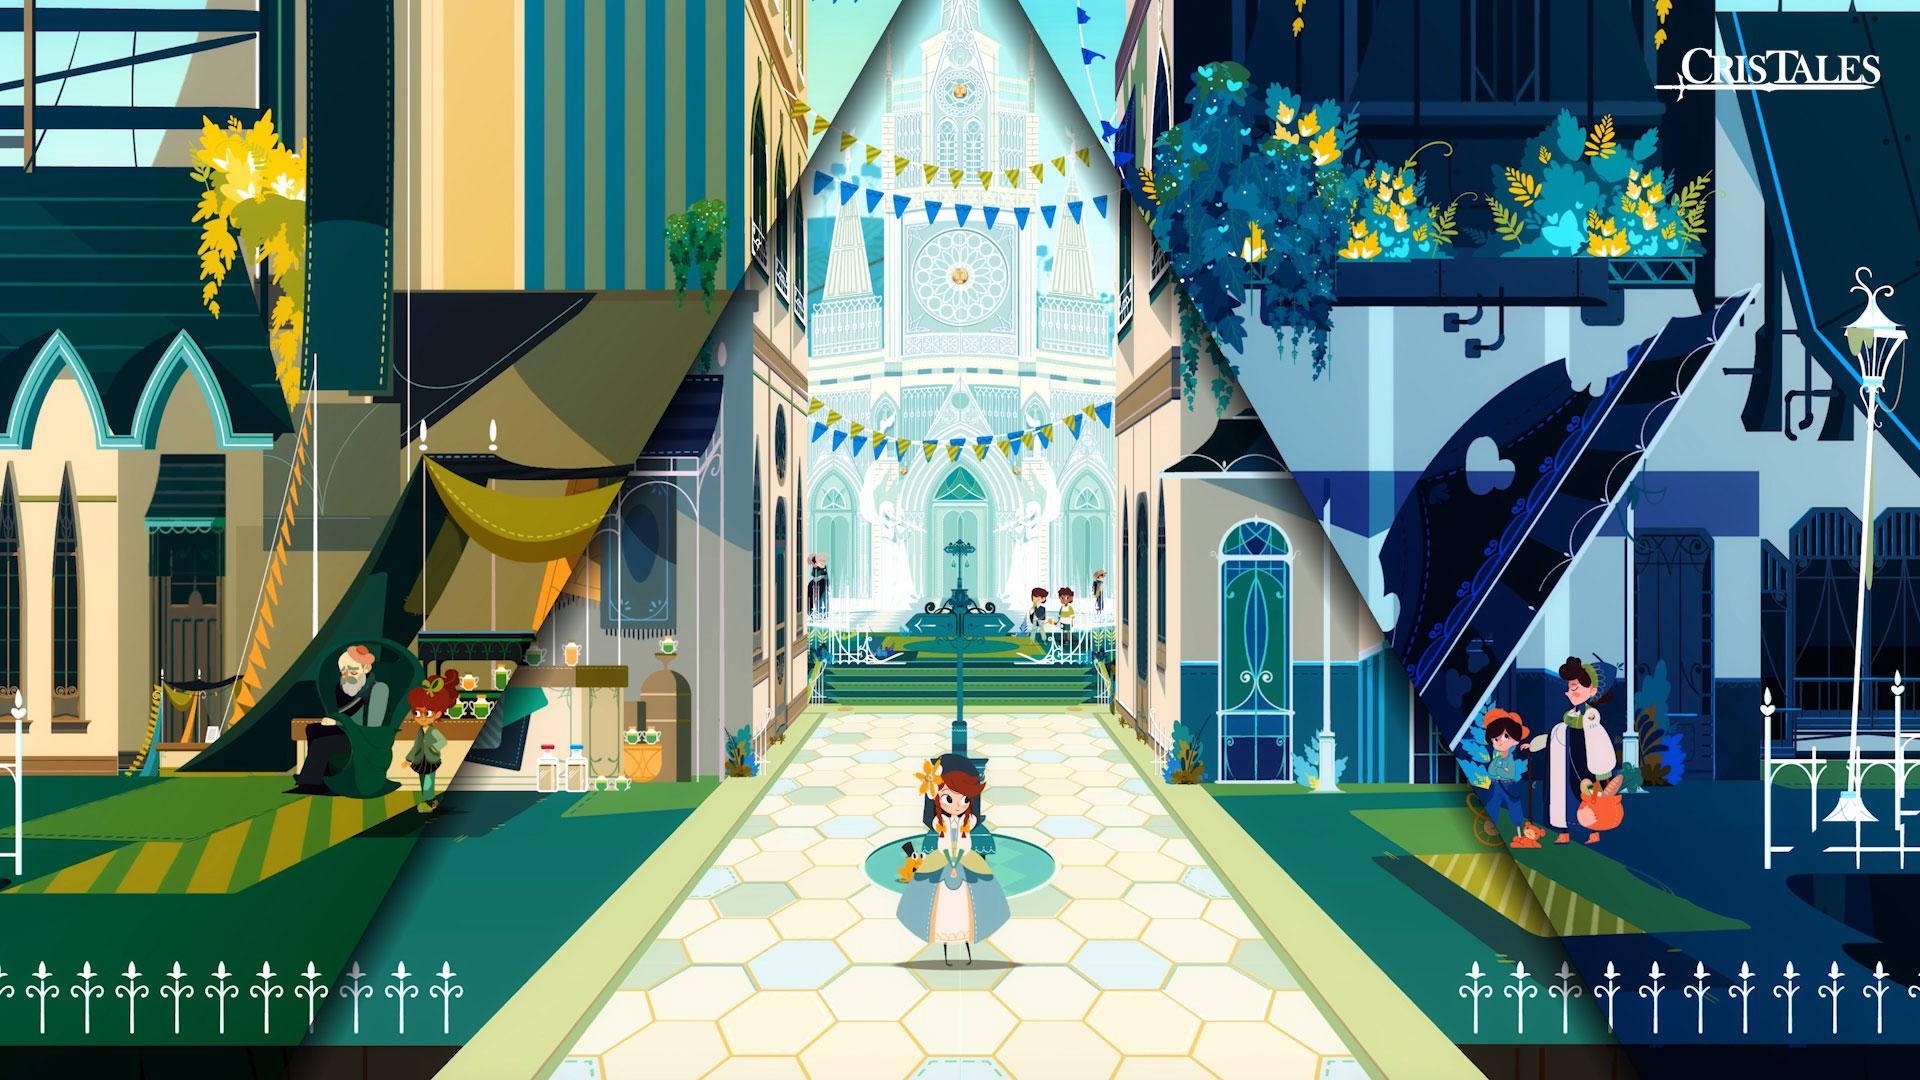 cris tales gameplay wallpaper 72889